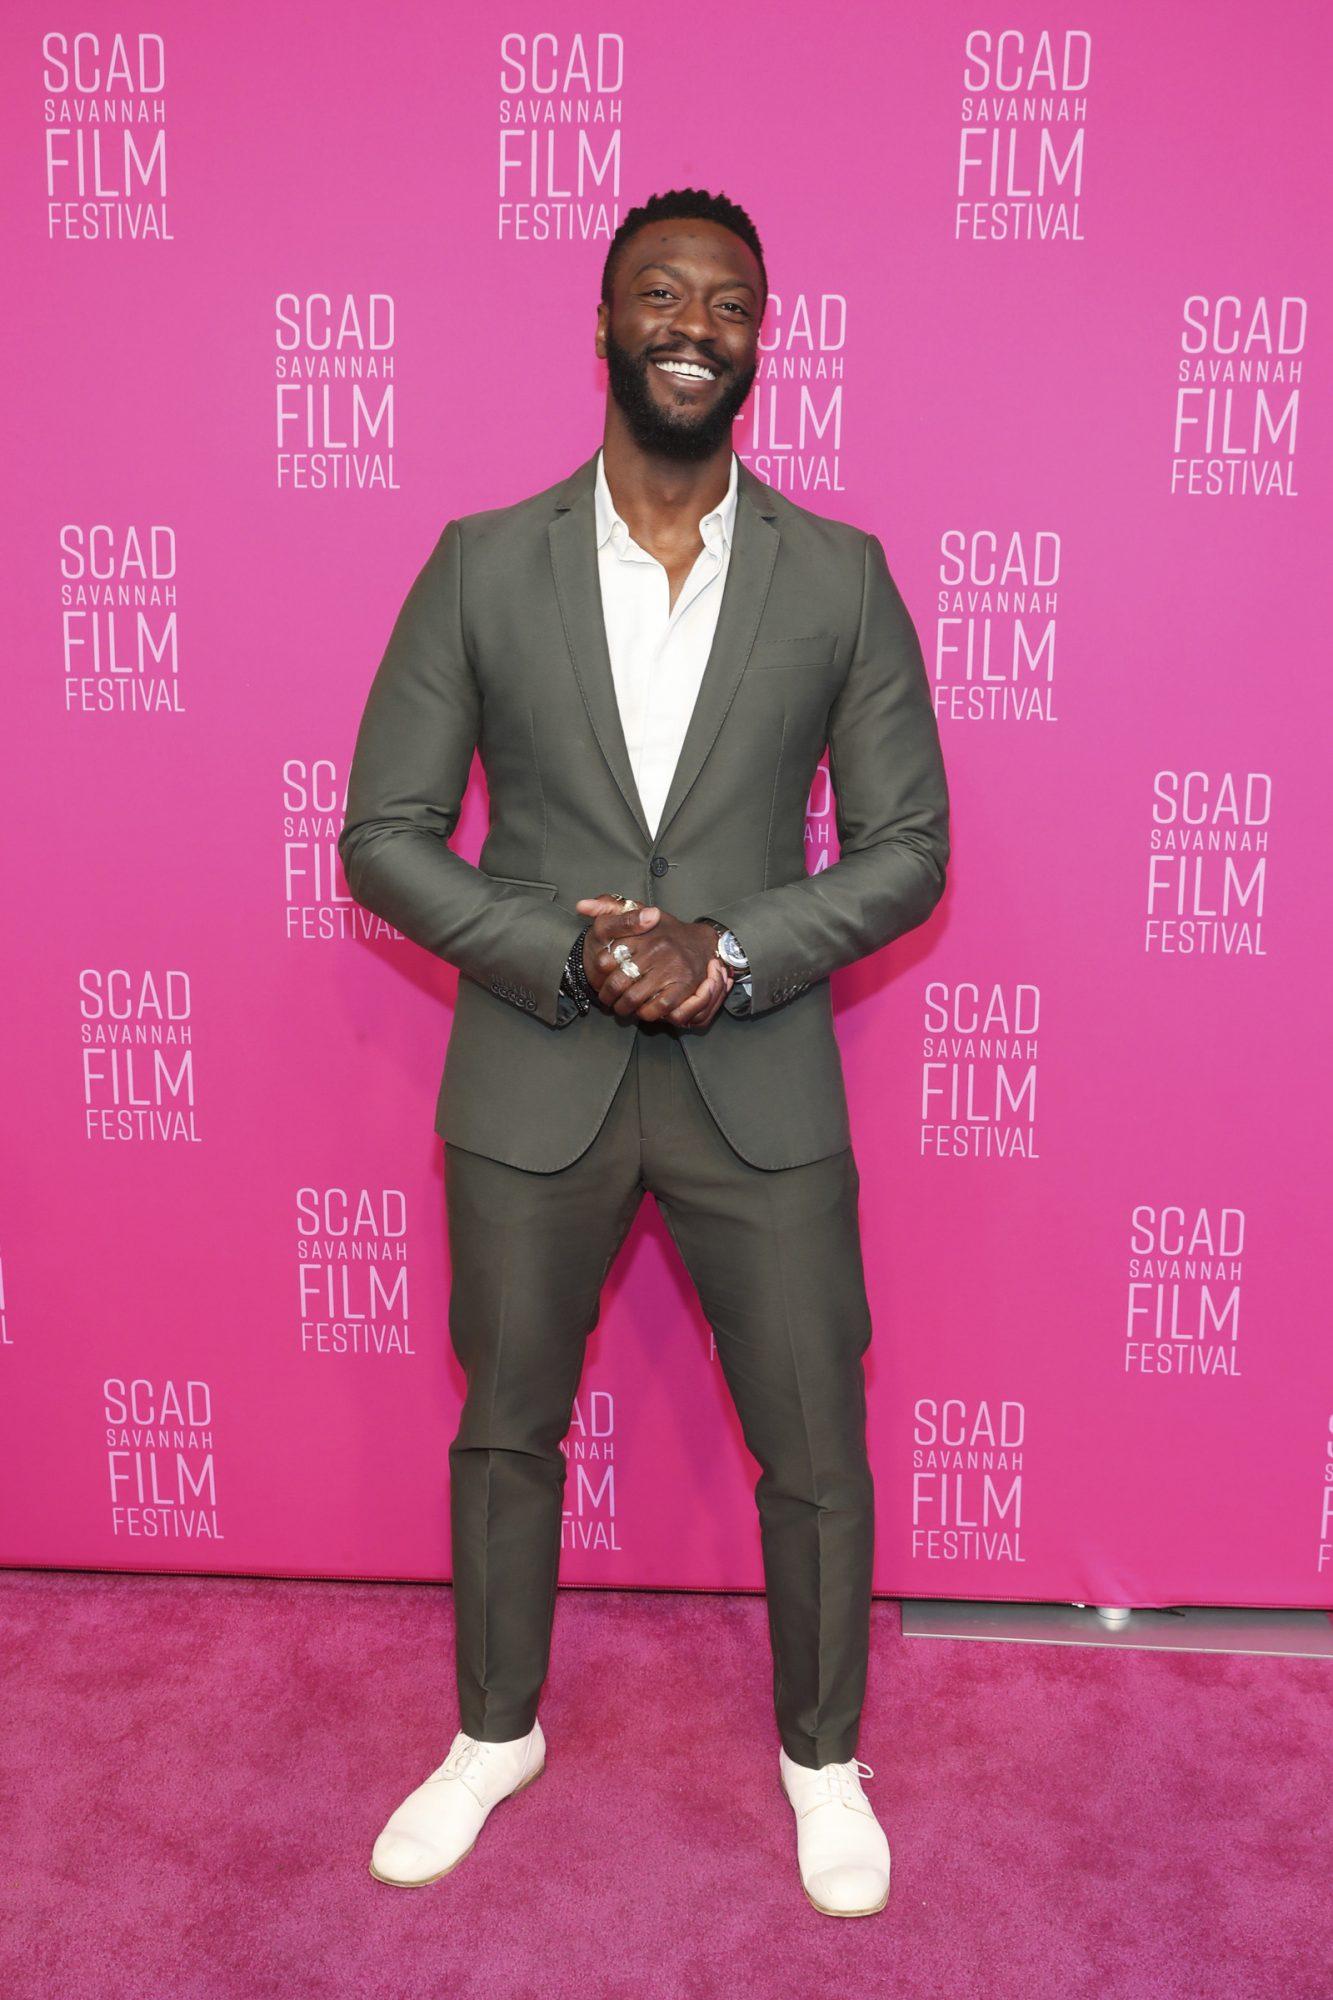 22nd SCAD Savannah Film Festival – Red Carpet - Day 3